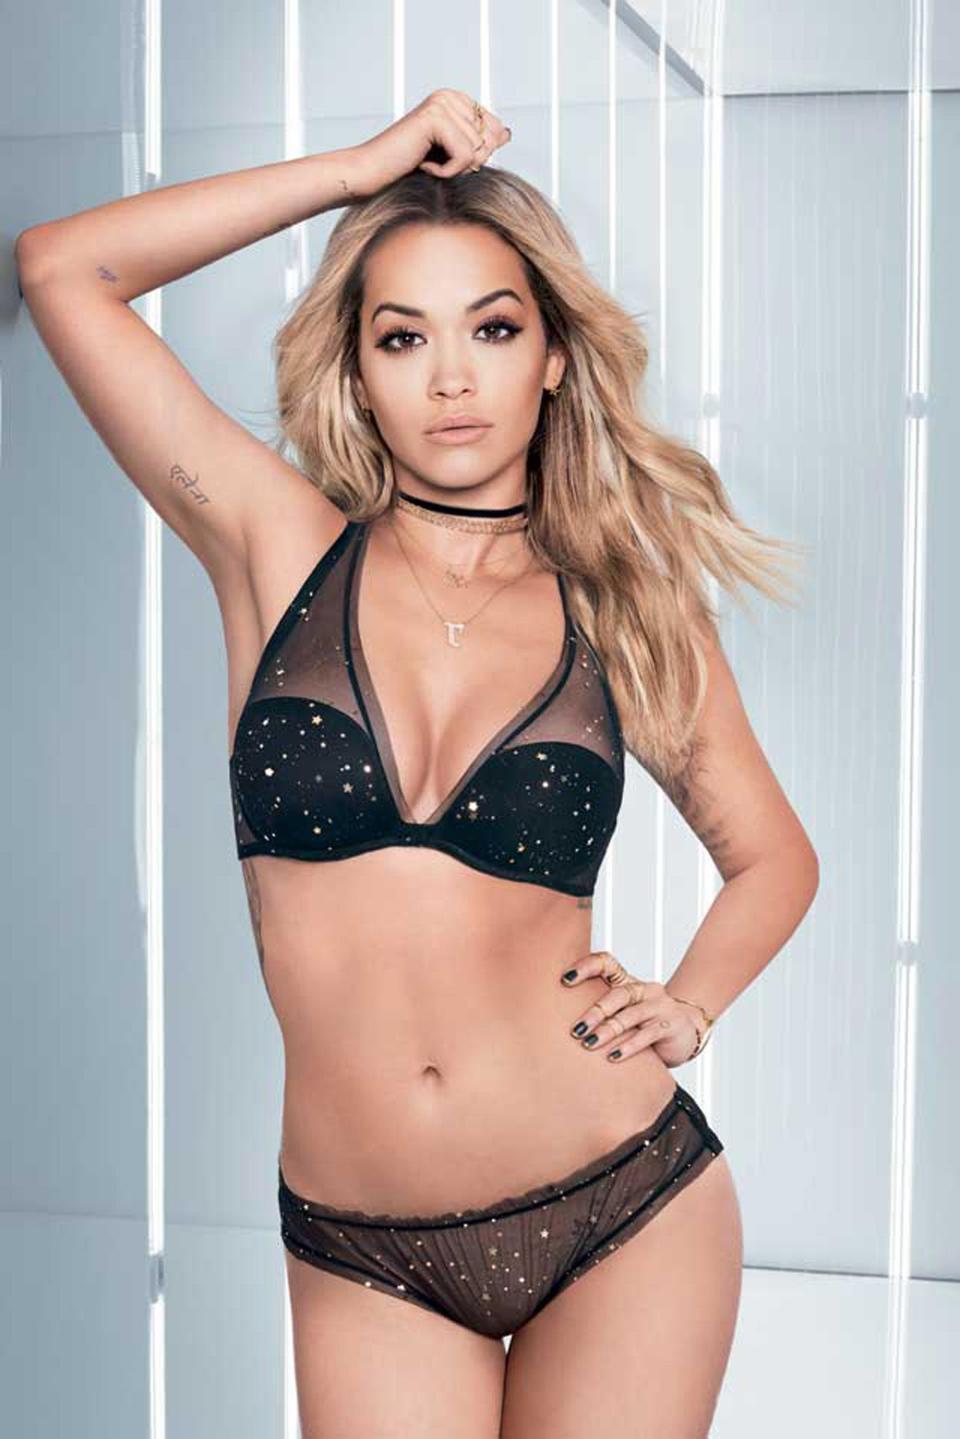 Rira Ora dazzles in a sparkly lingerie in new campaign shots for Italian brand Tezenis